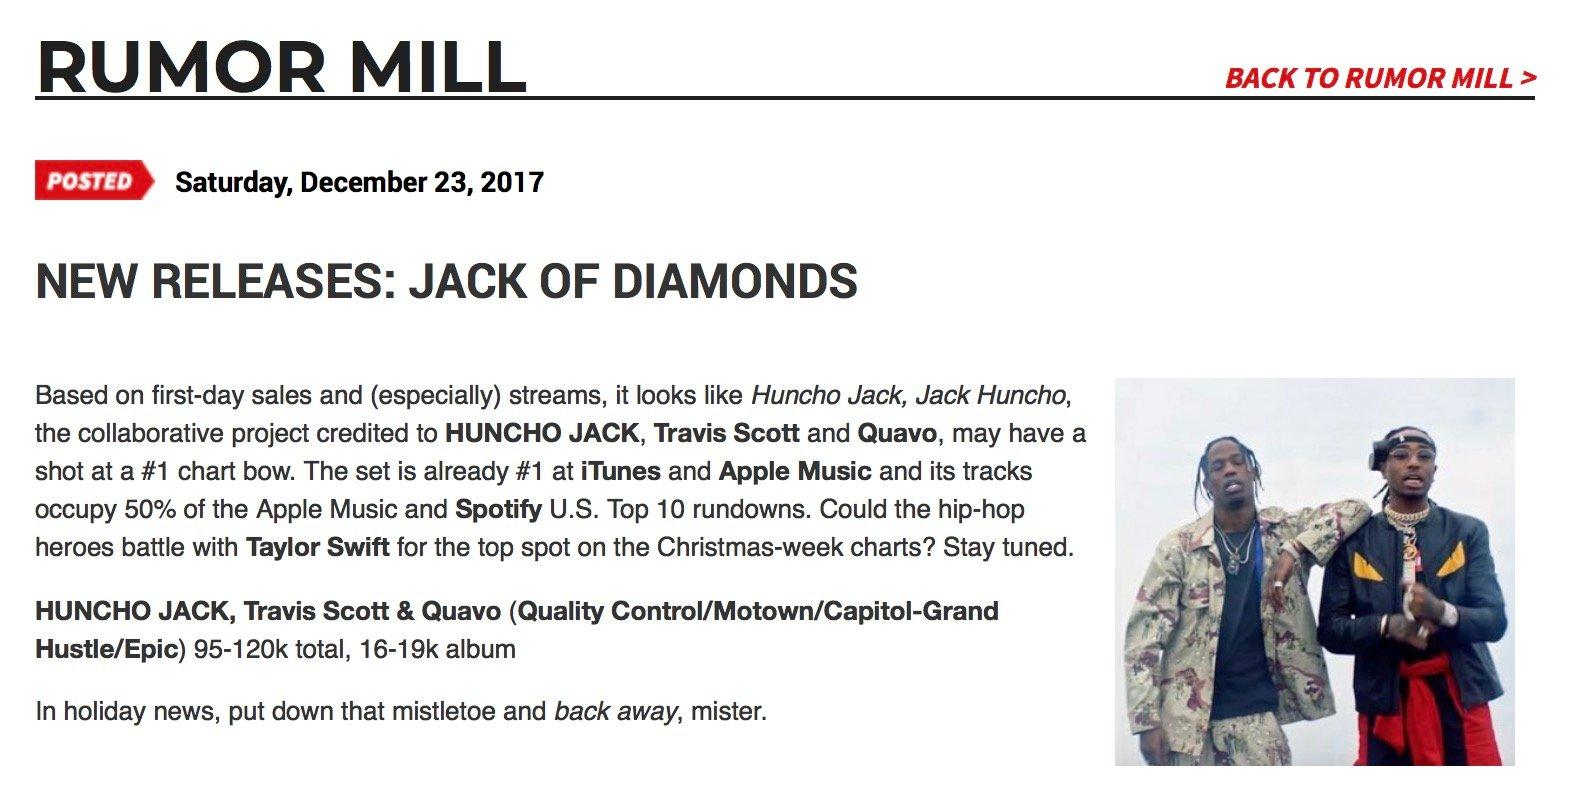 Travis Scott & Quavo's HUNCHO JACK Debut Ahead Of Eminem's REVIVAL, First-Week Sales Revealed –